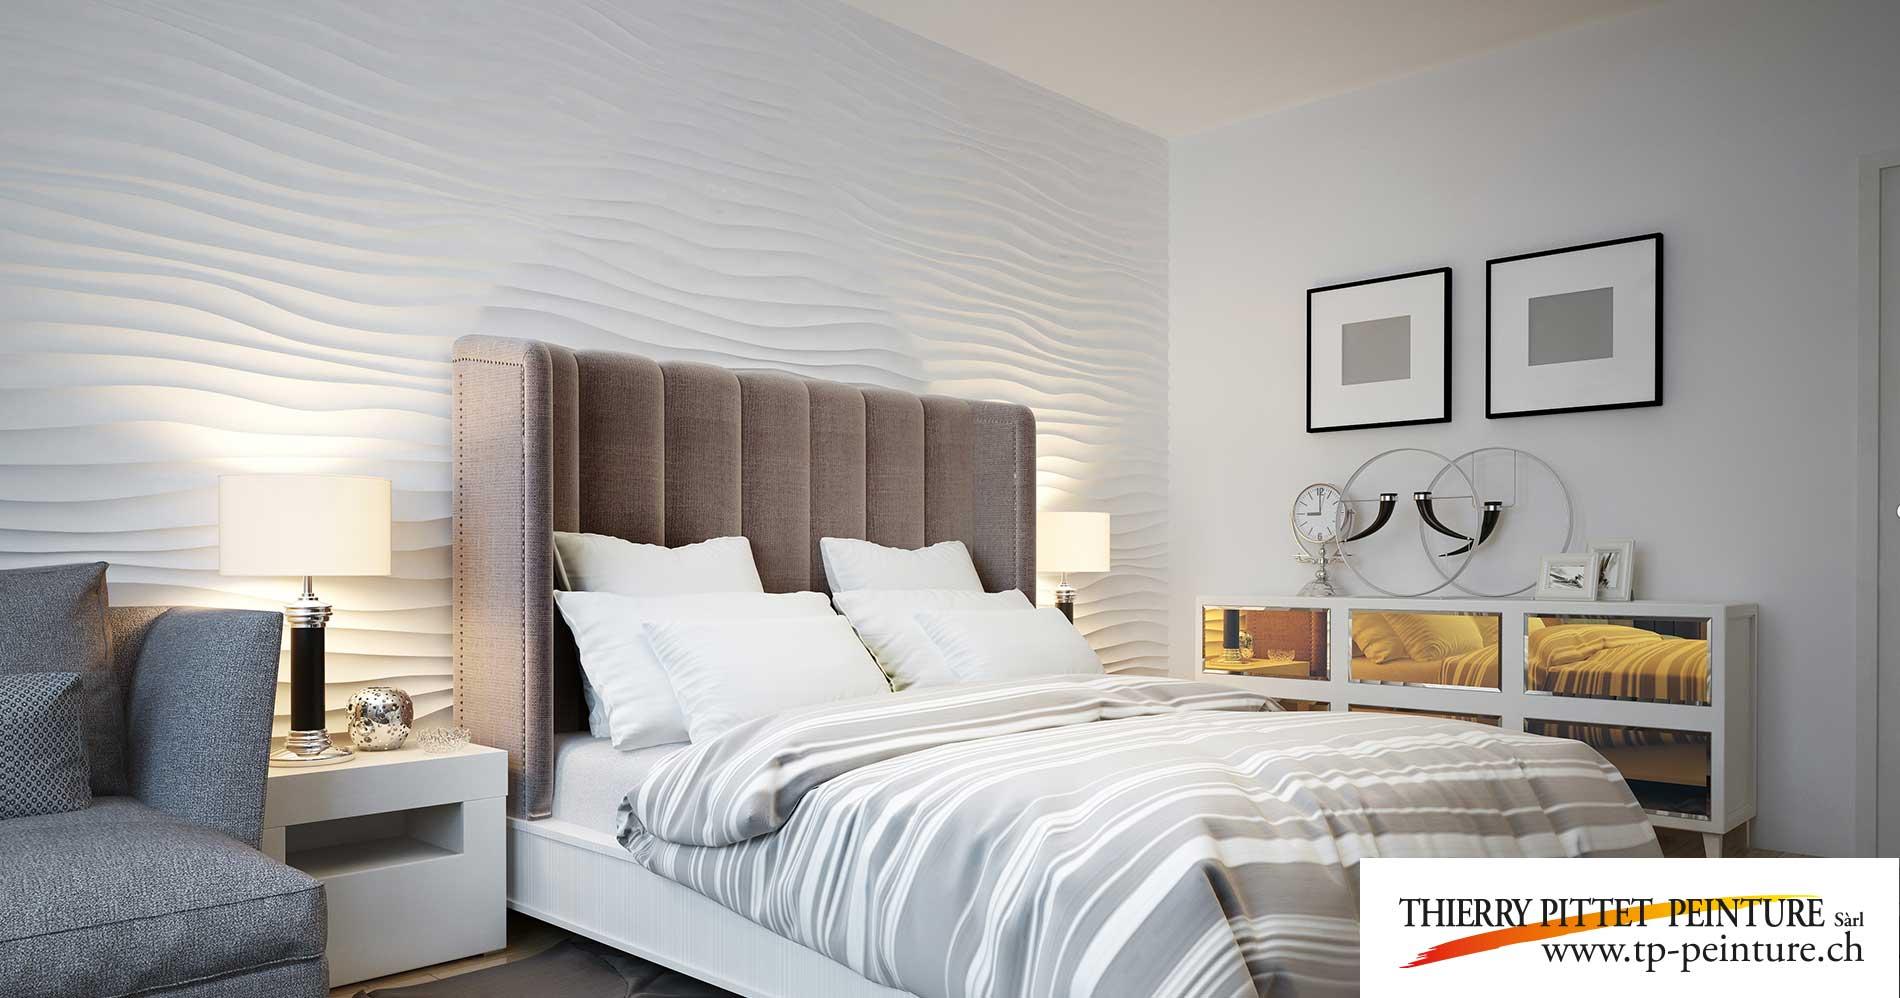 thierry pittet peinture s rl actualit s. Black Bedroom Furniture Sets. Home Design Ideas